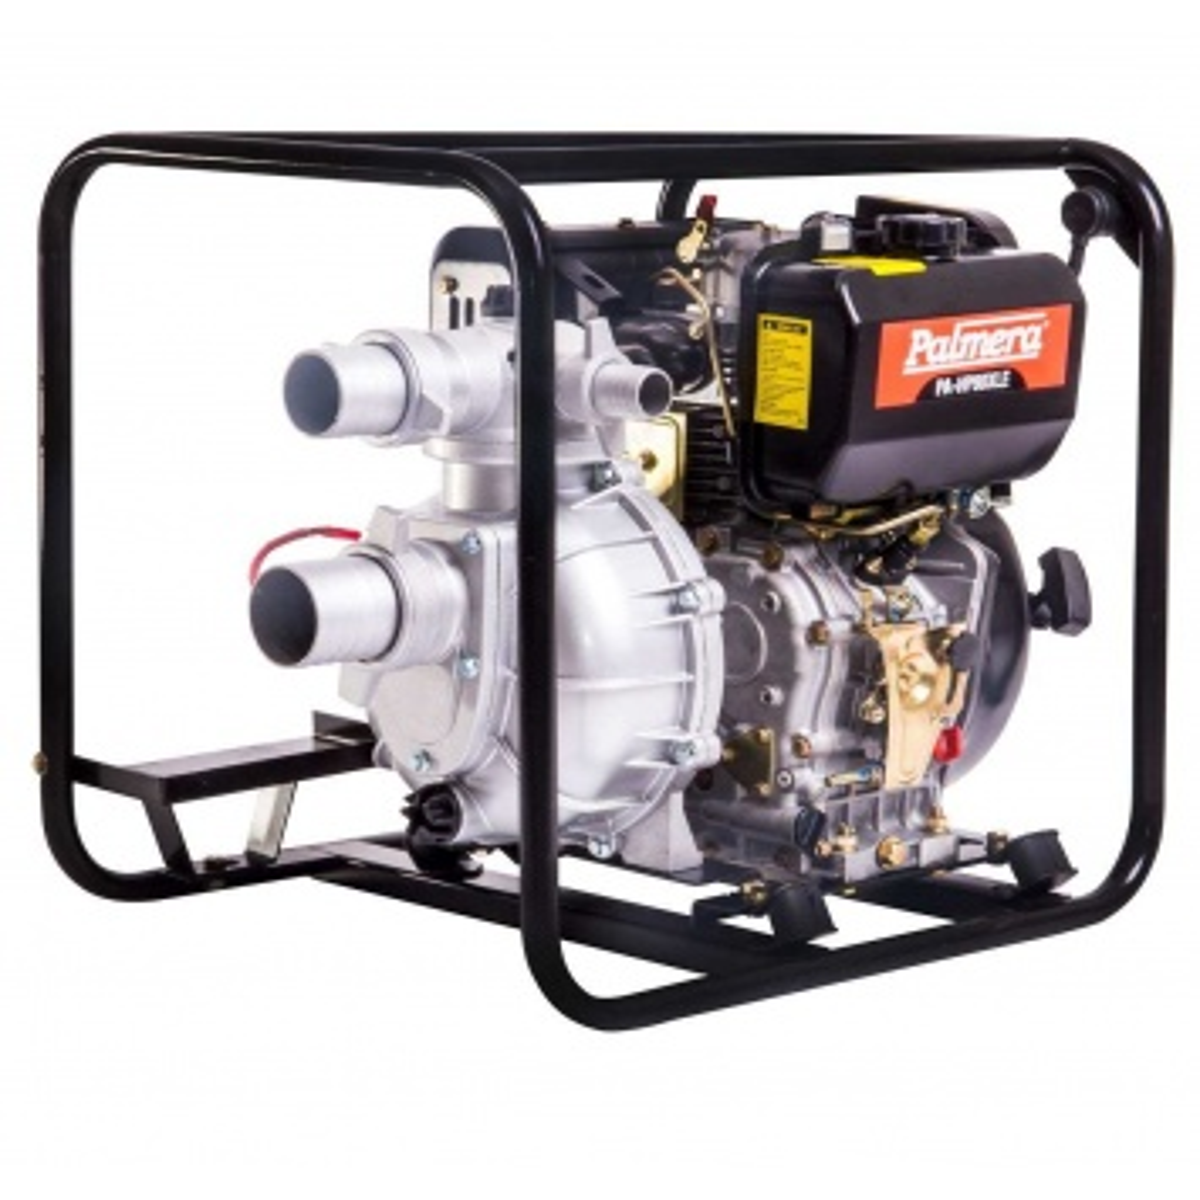 Palmera HP80XLE Dizel Marşlı Su Motoru